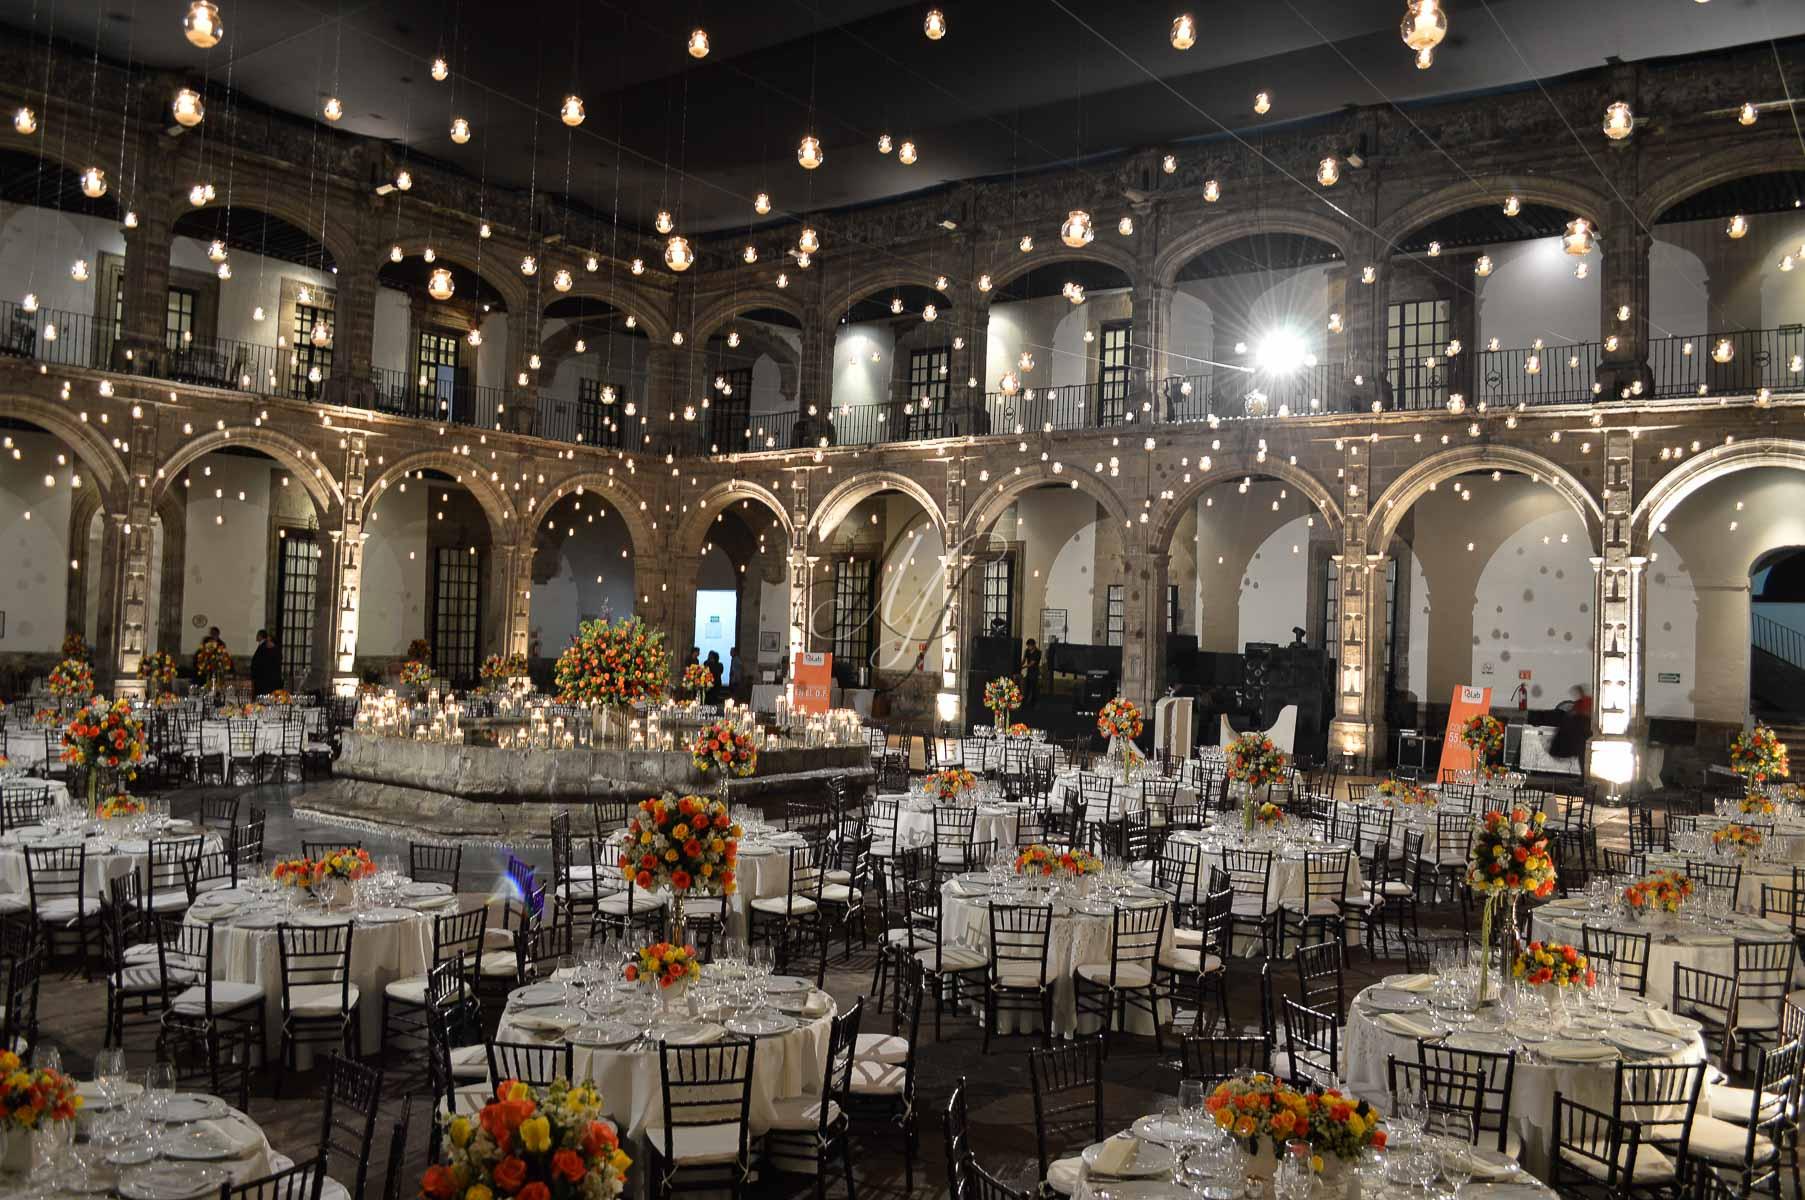 Bodas recintos ex convento san hipolito df6 banquetes for Jardines bodas df